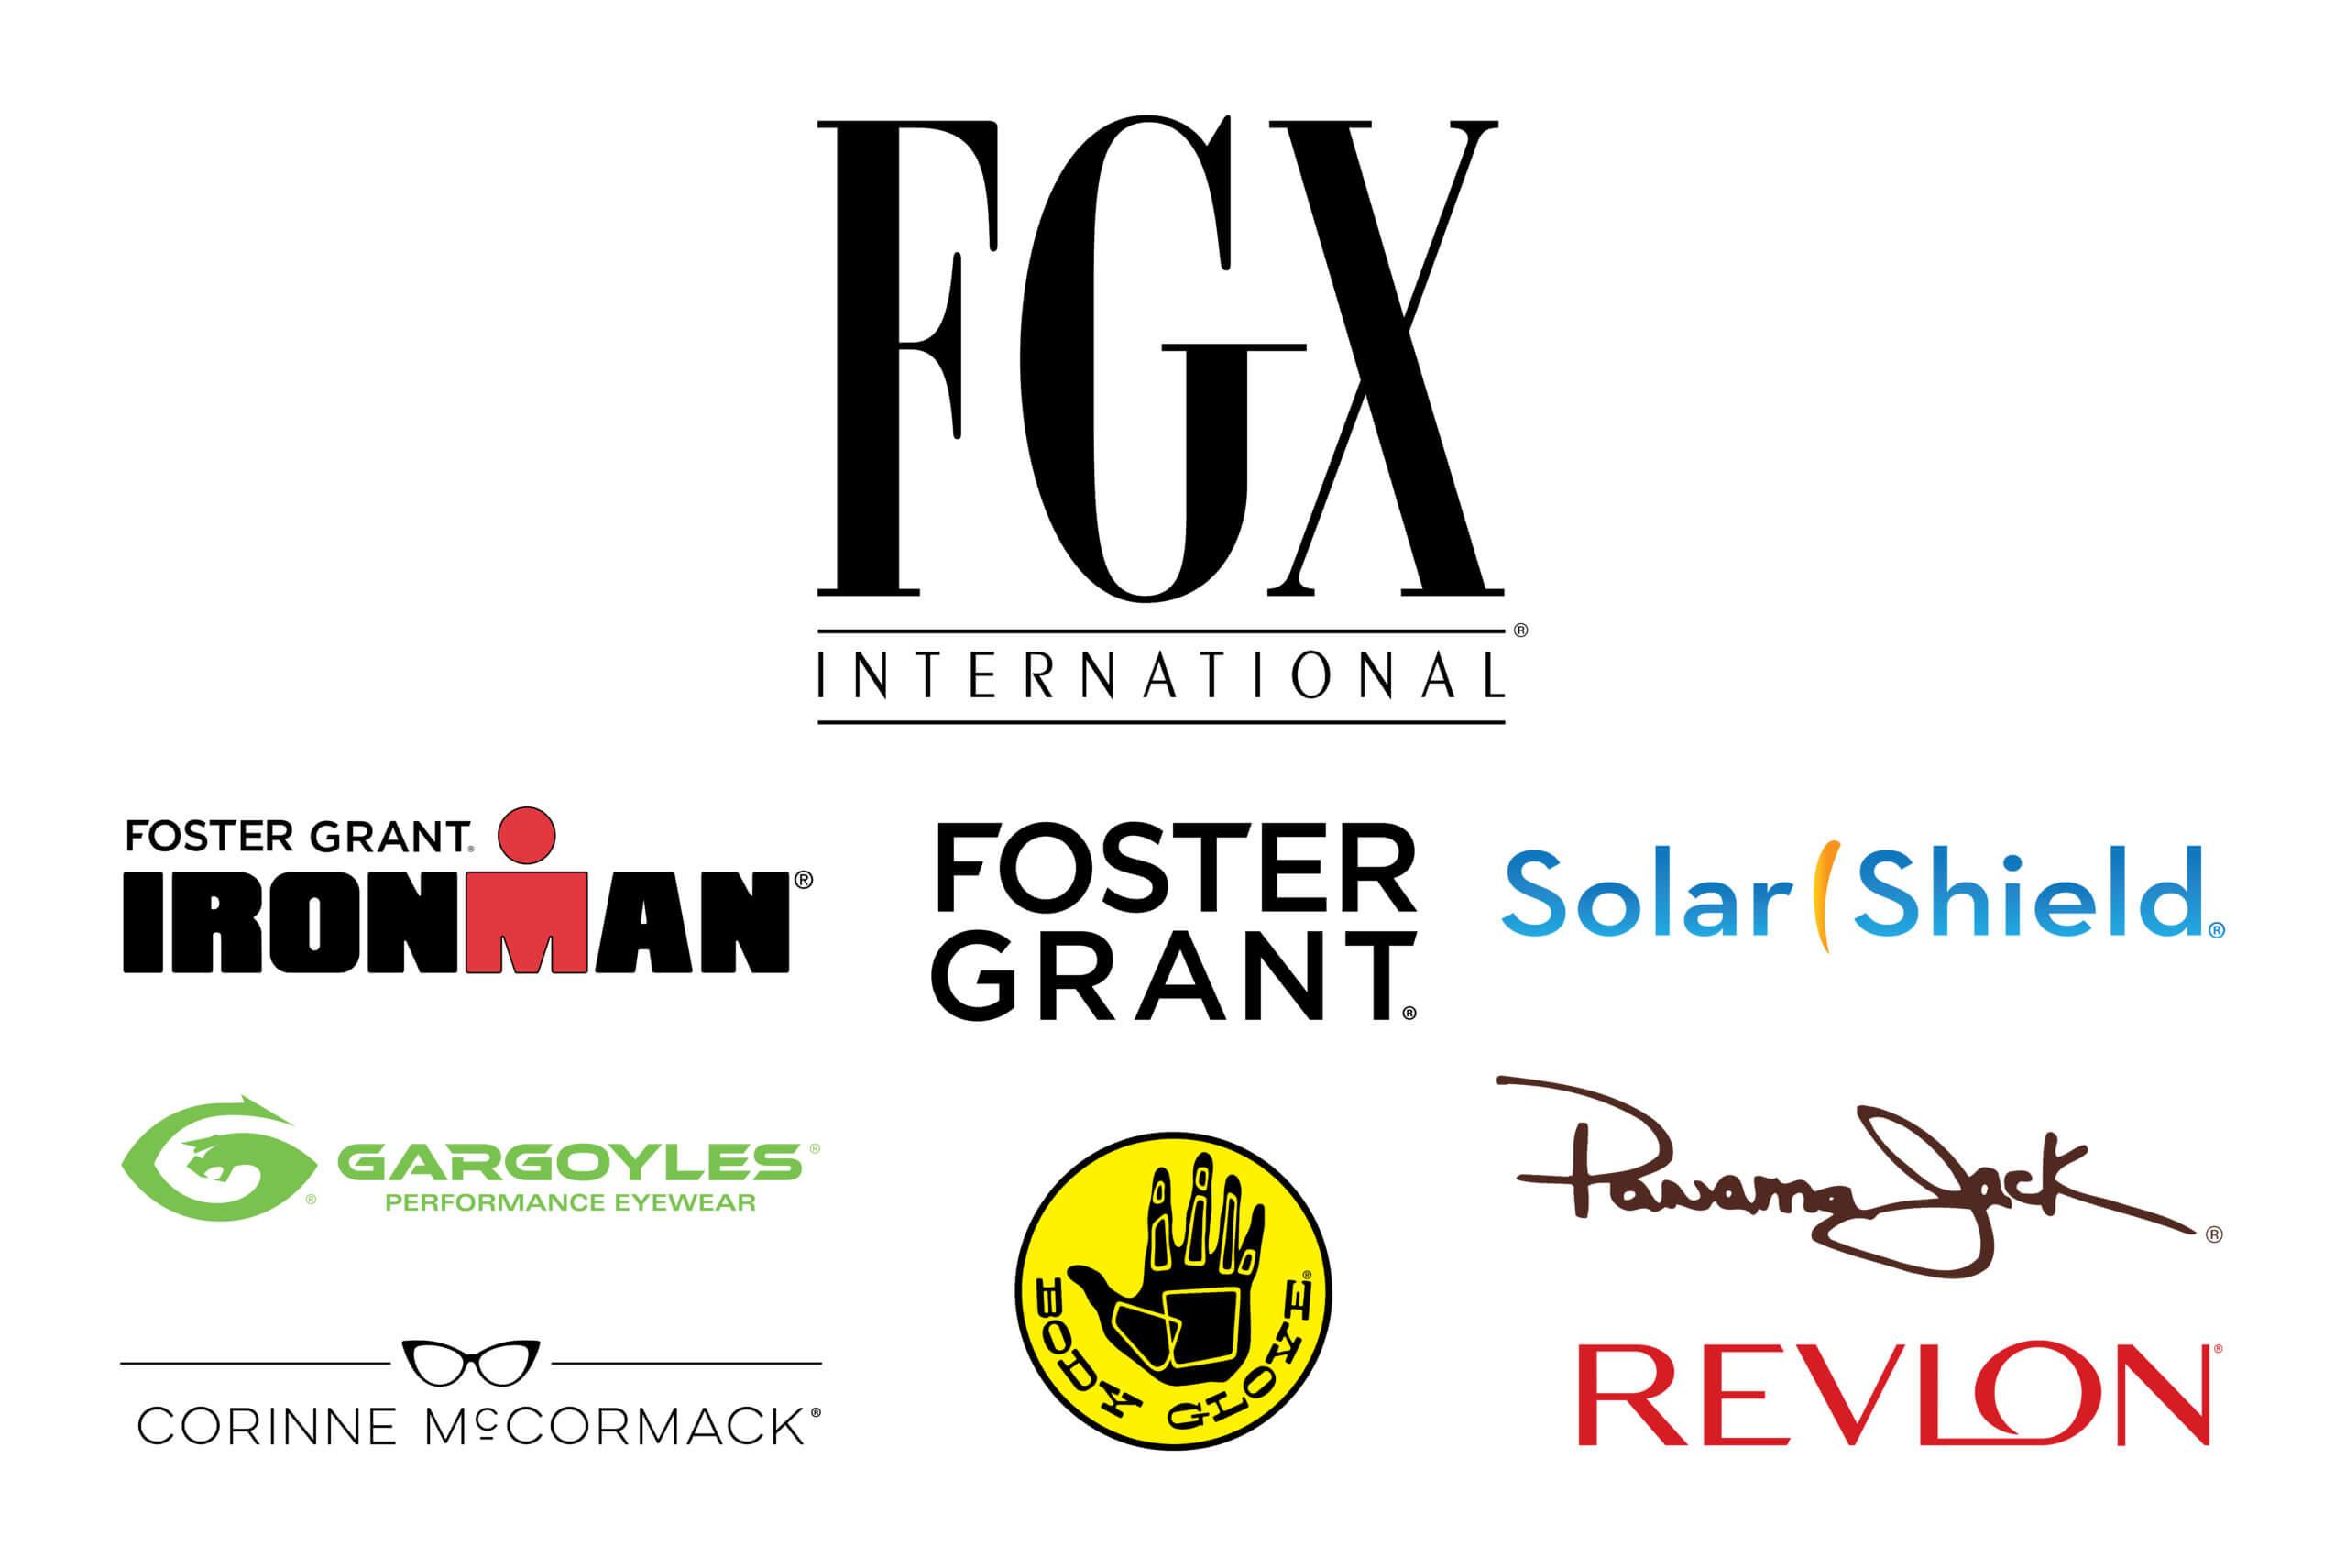 FGX International